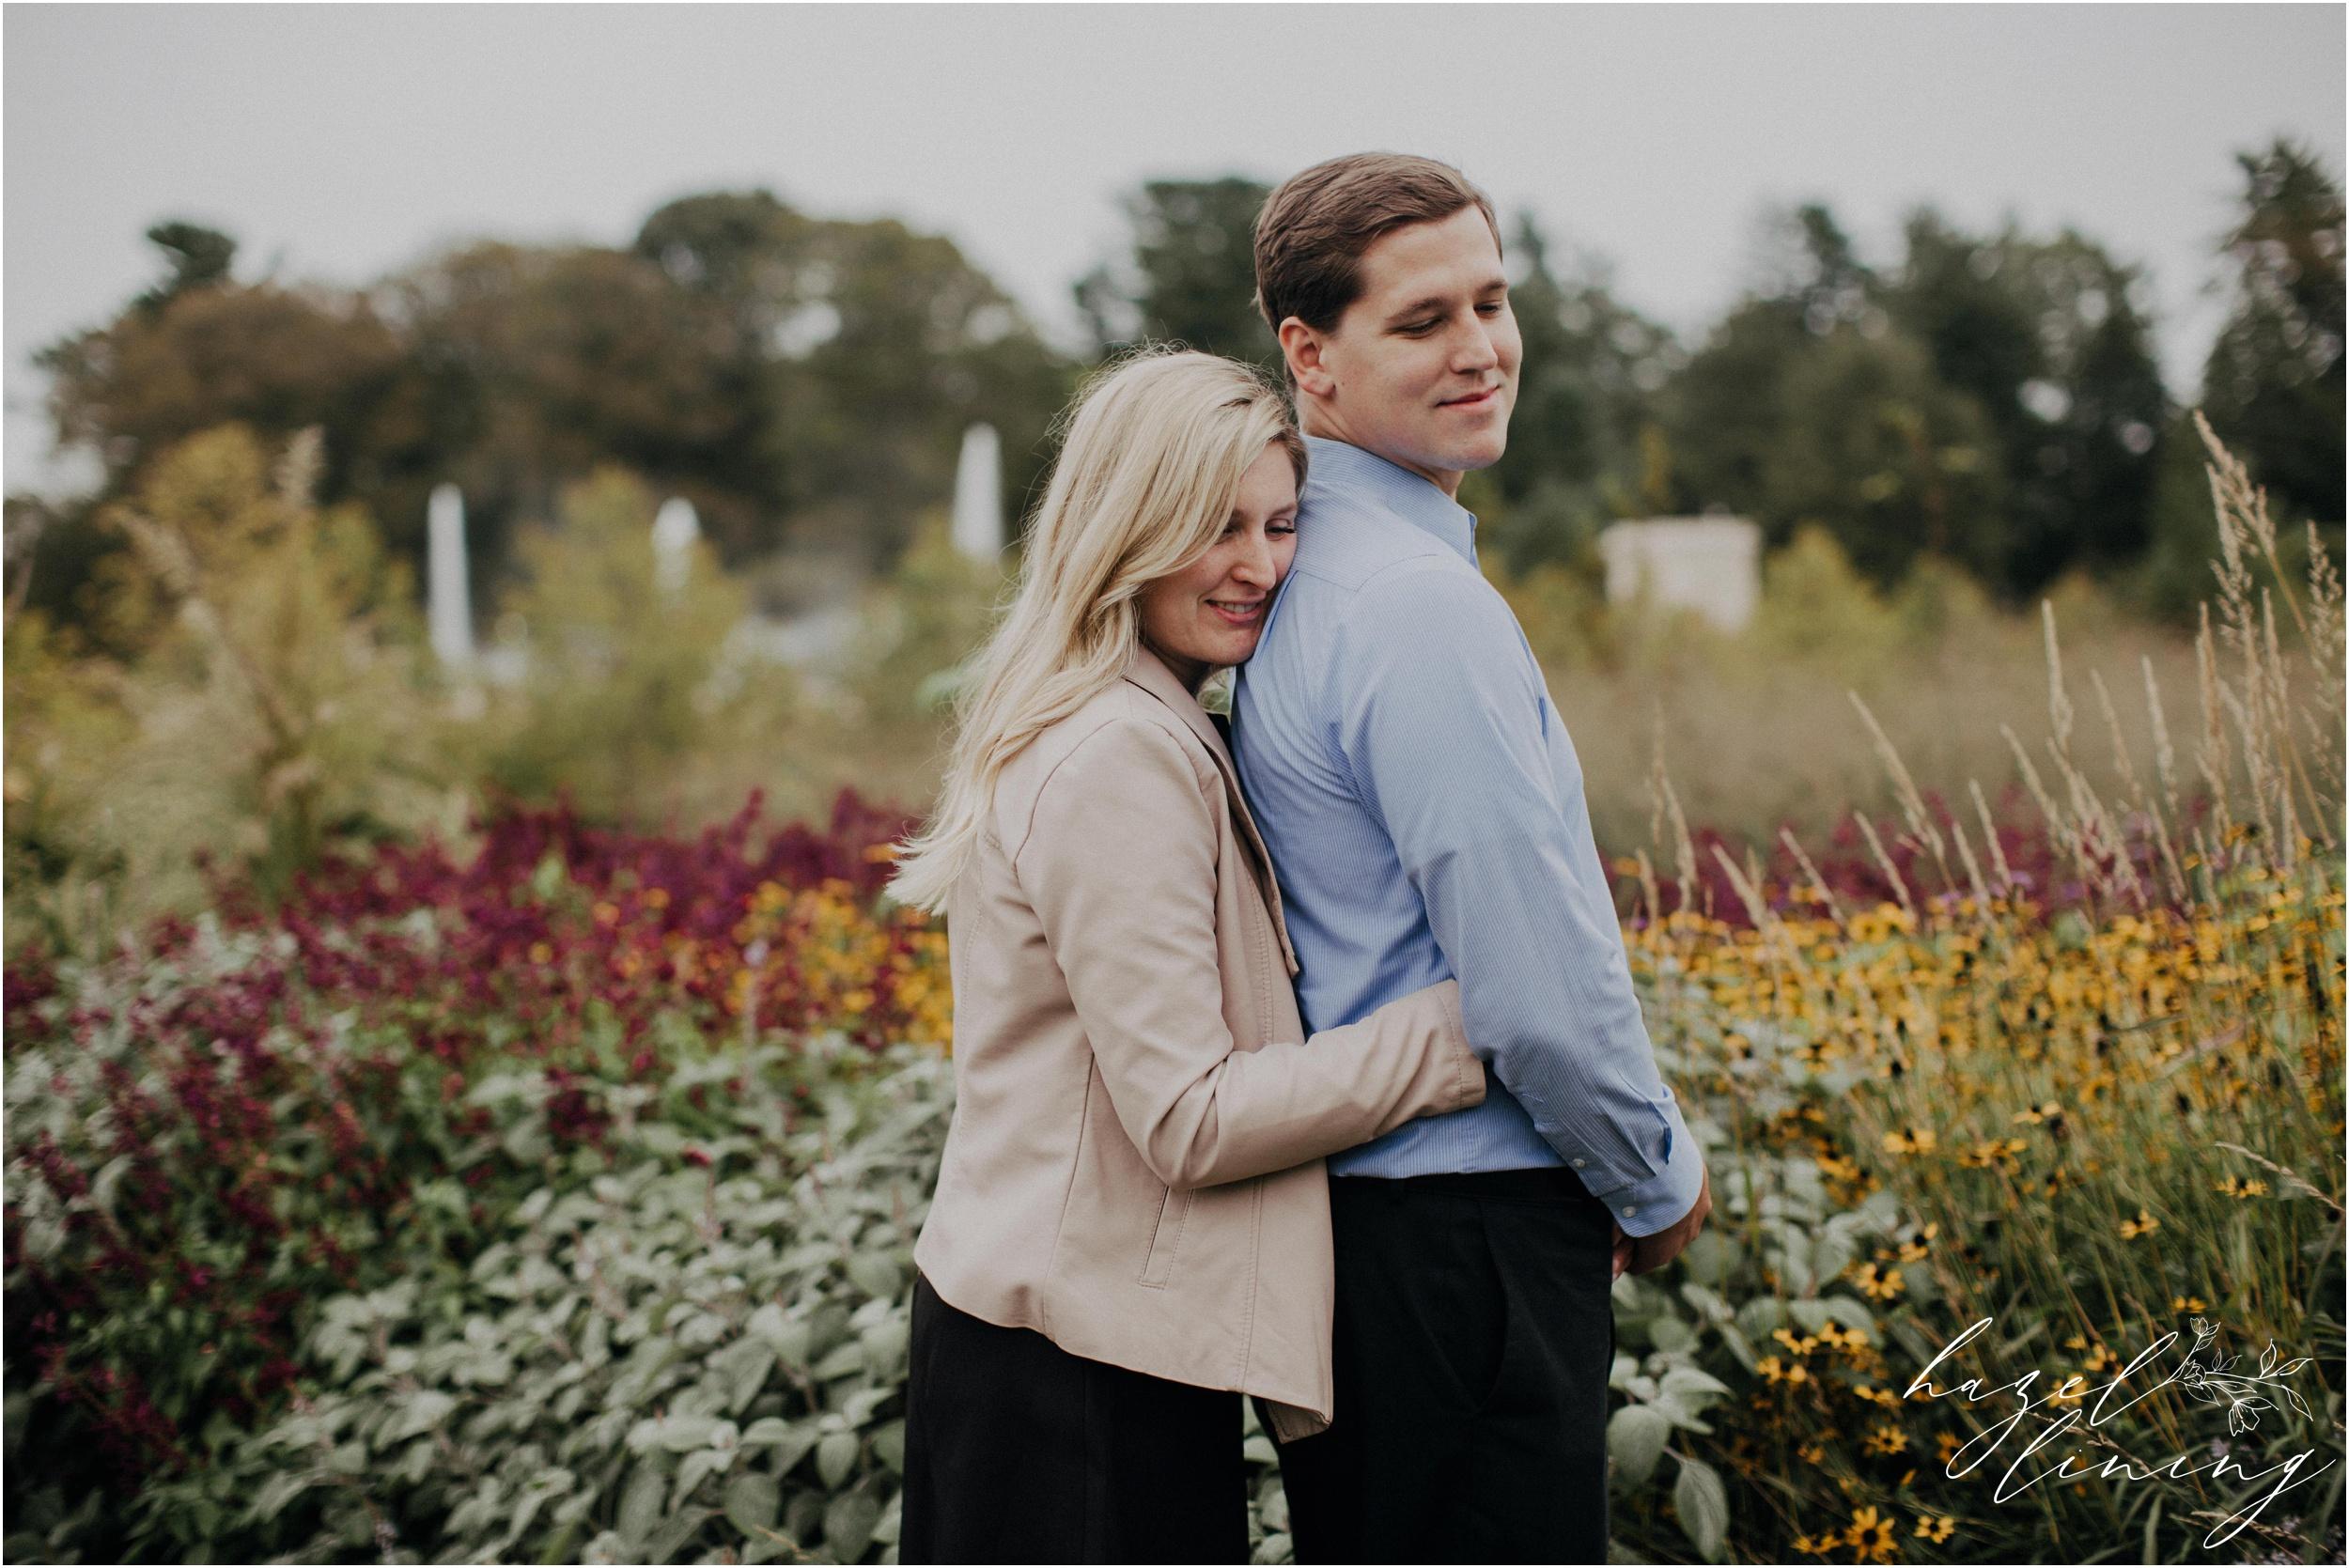 victoria-travis-logan-mayes-longwood-gardens-kennett-square-philadelphia-engagement-session-hazel-lining-photography-destination-elopement-wedding-engagement-photography_0028.jpg